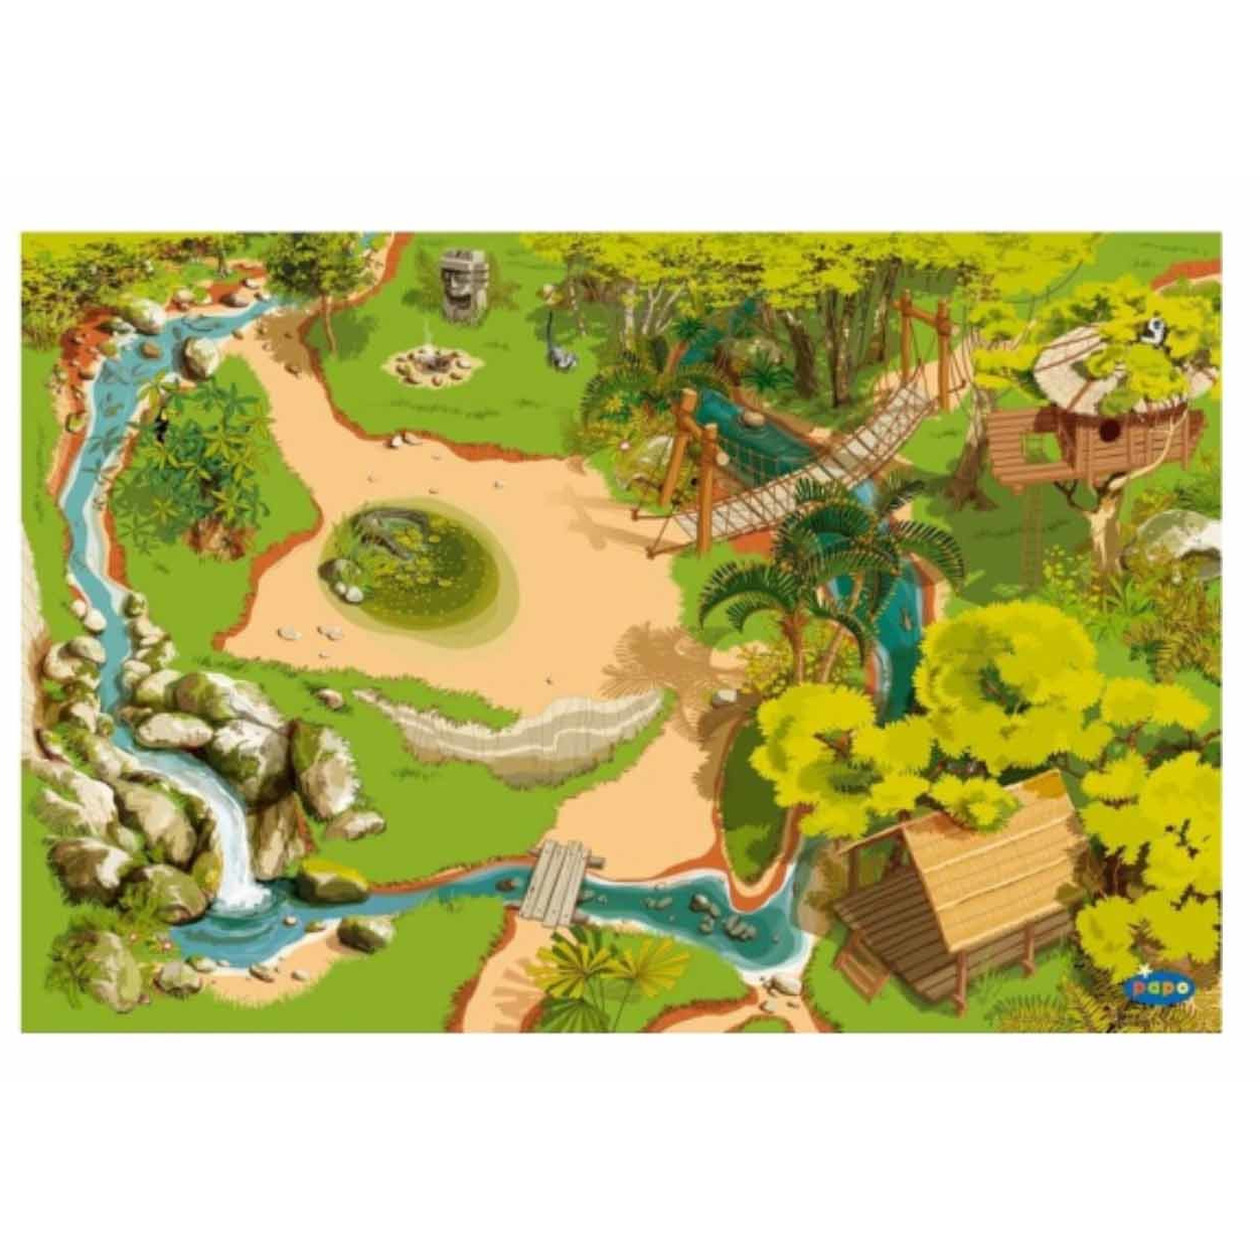 Kinderkamer Jungle: Muurschildering m s jungle room klaar. Muursticker ...